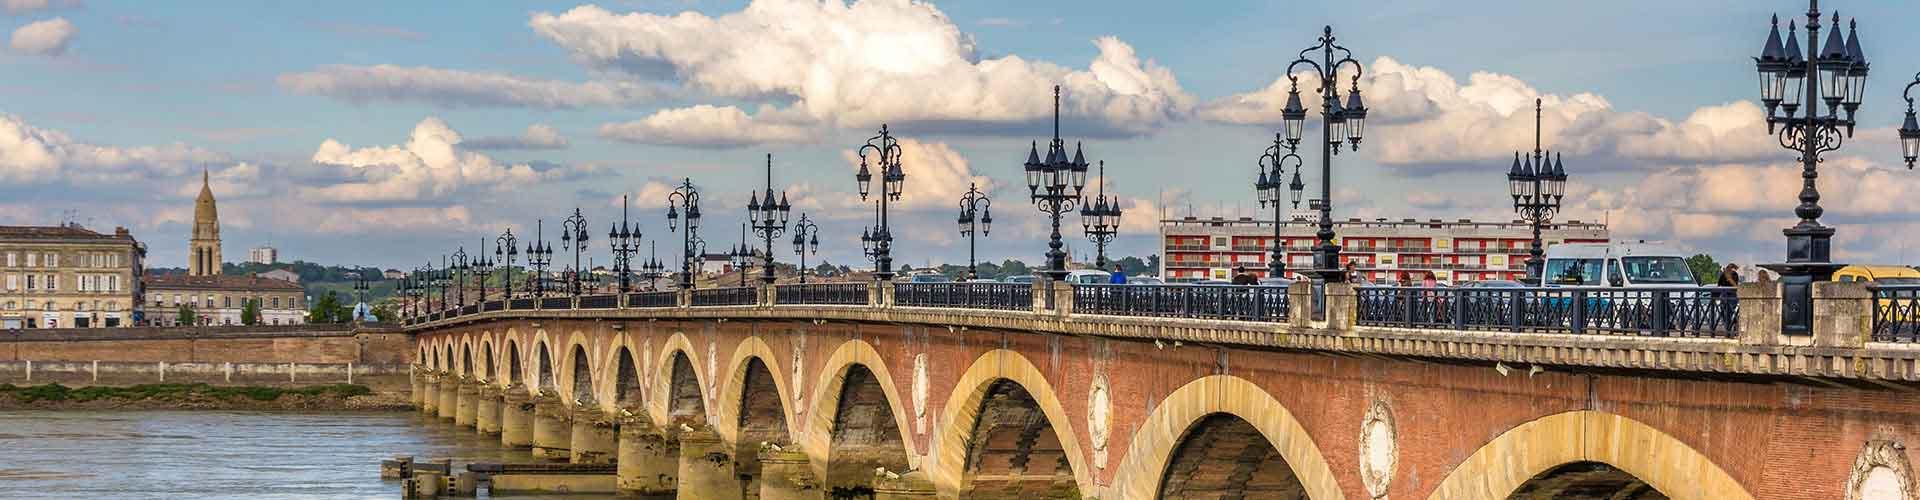 Bordeaux - Albergues en Bordeaux. Mapas de Bordeaux, Fotos y Comentarios para cada Albergue en Bordeaux.